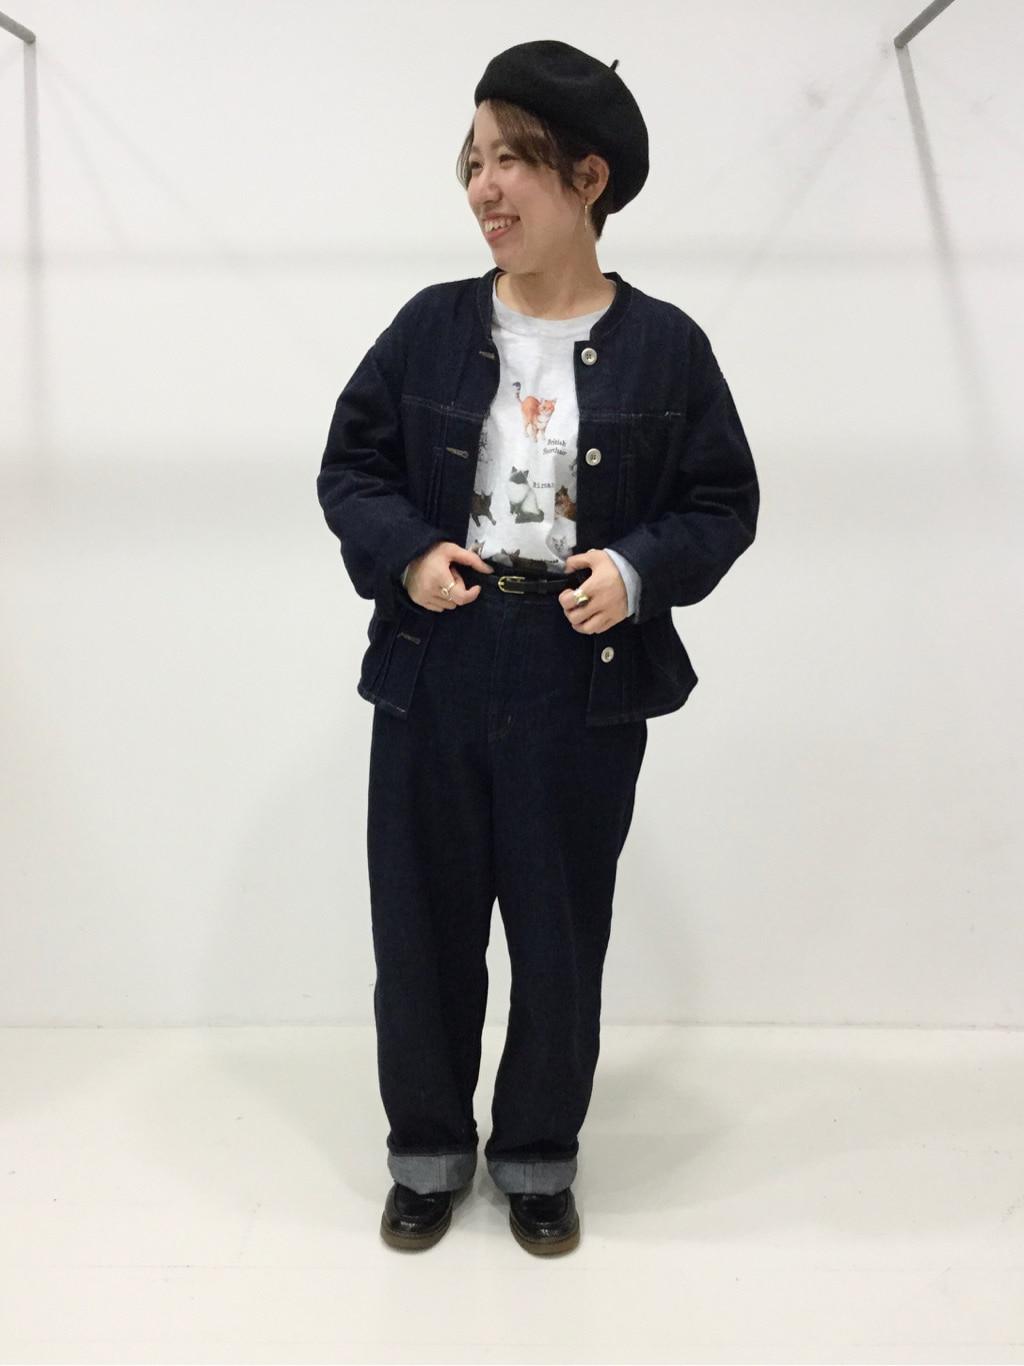 bulle de savon なんばシティ 身長:148cm 2020.02.11